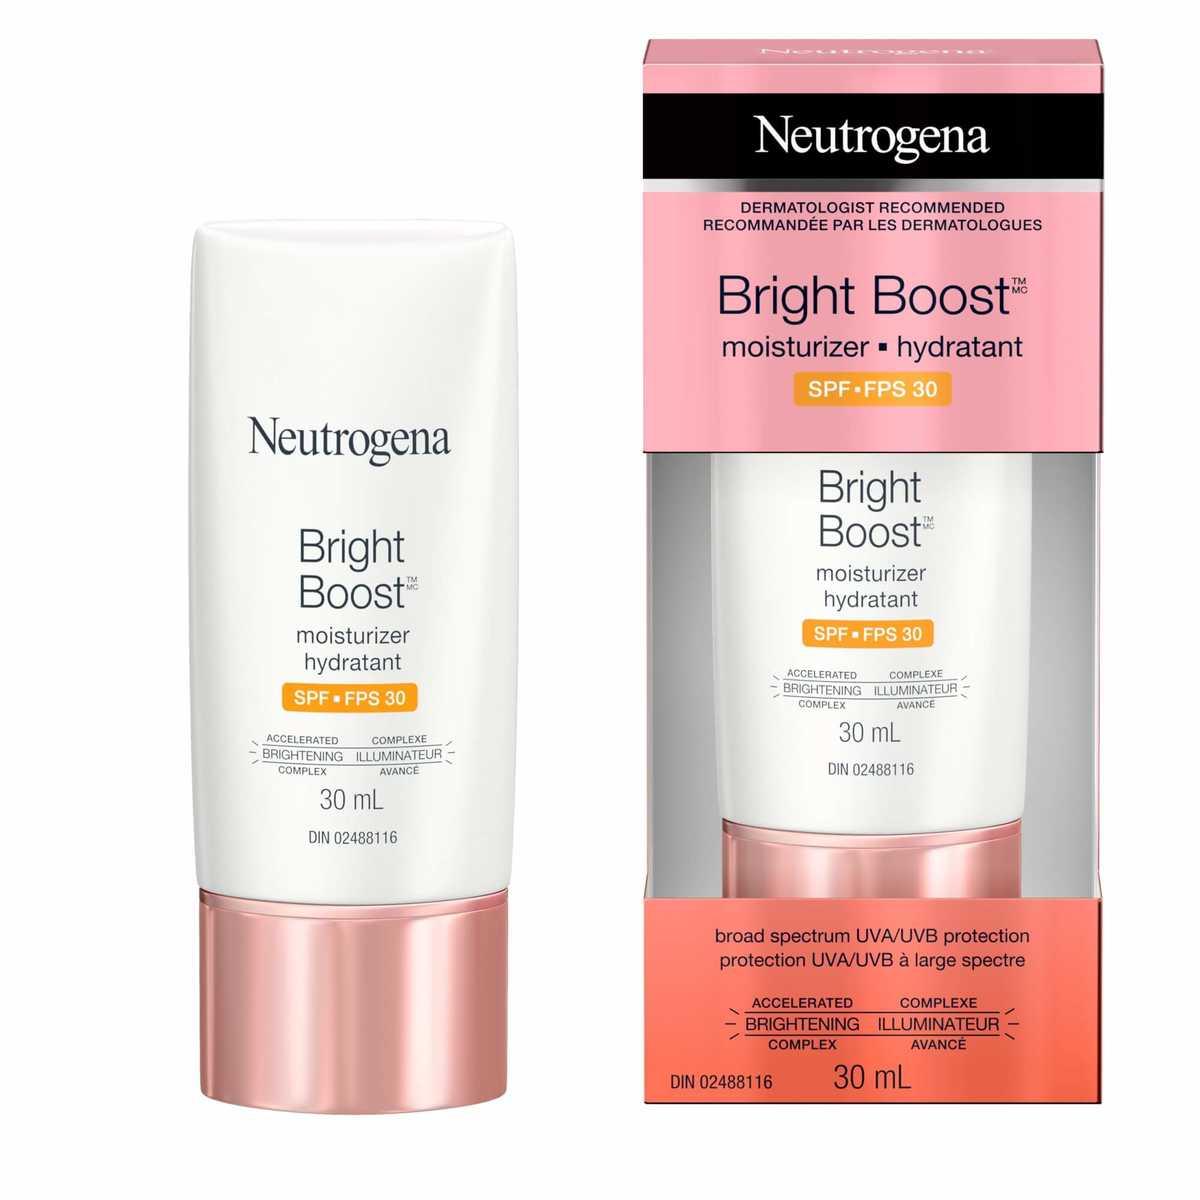 Hydratant Neutrogena Bright Boost Moisturizer FPS 30